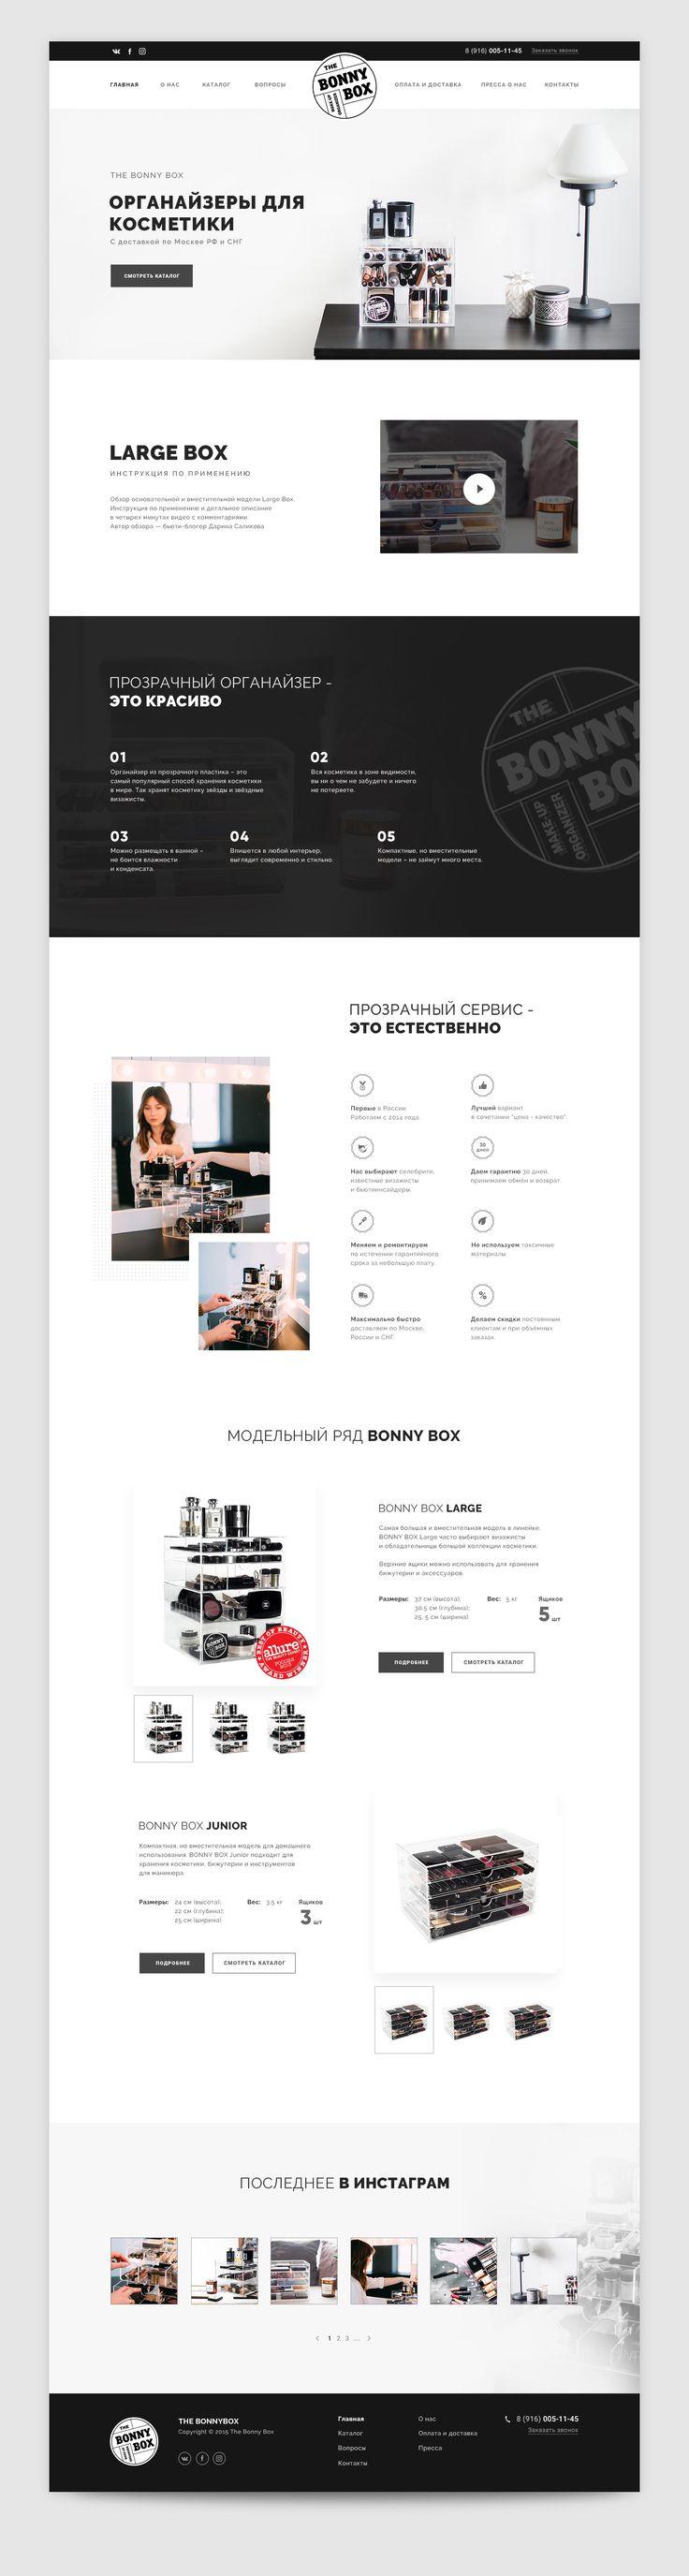 BonnyBox website redesign